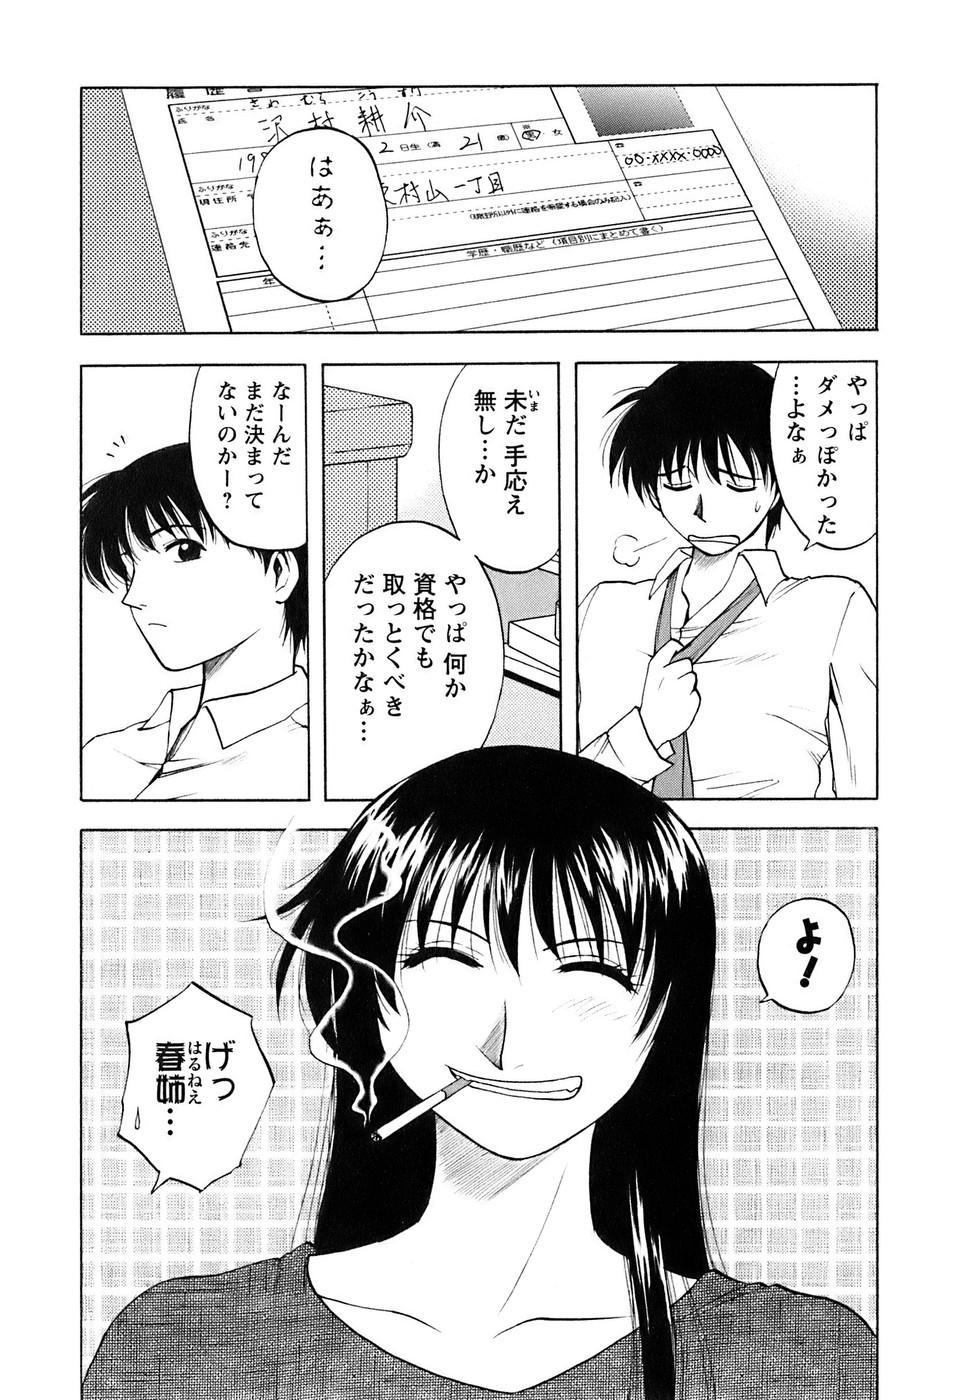 Okusan Volley - Madam Volleyball 156